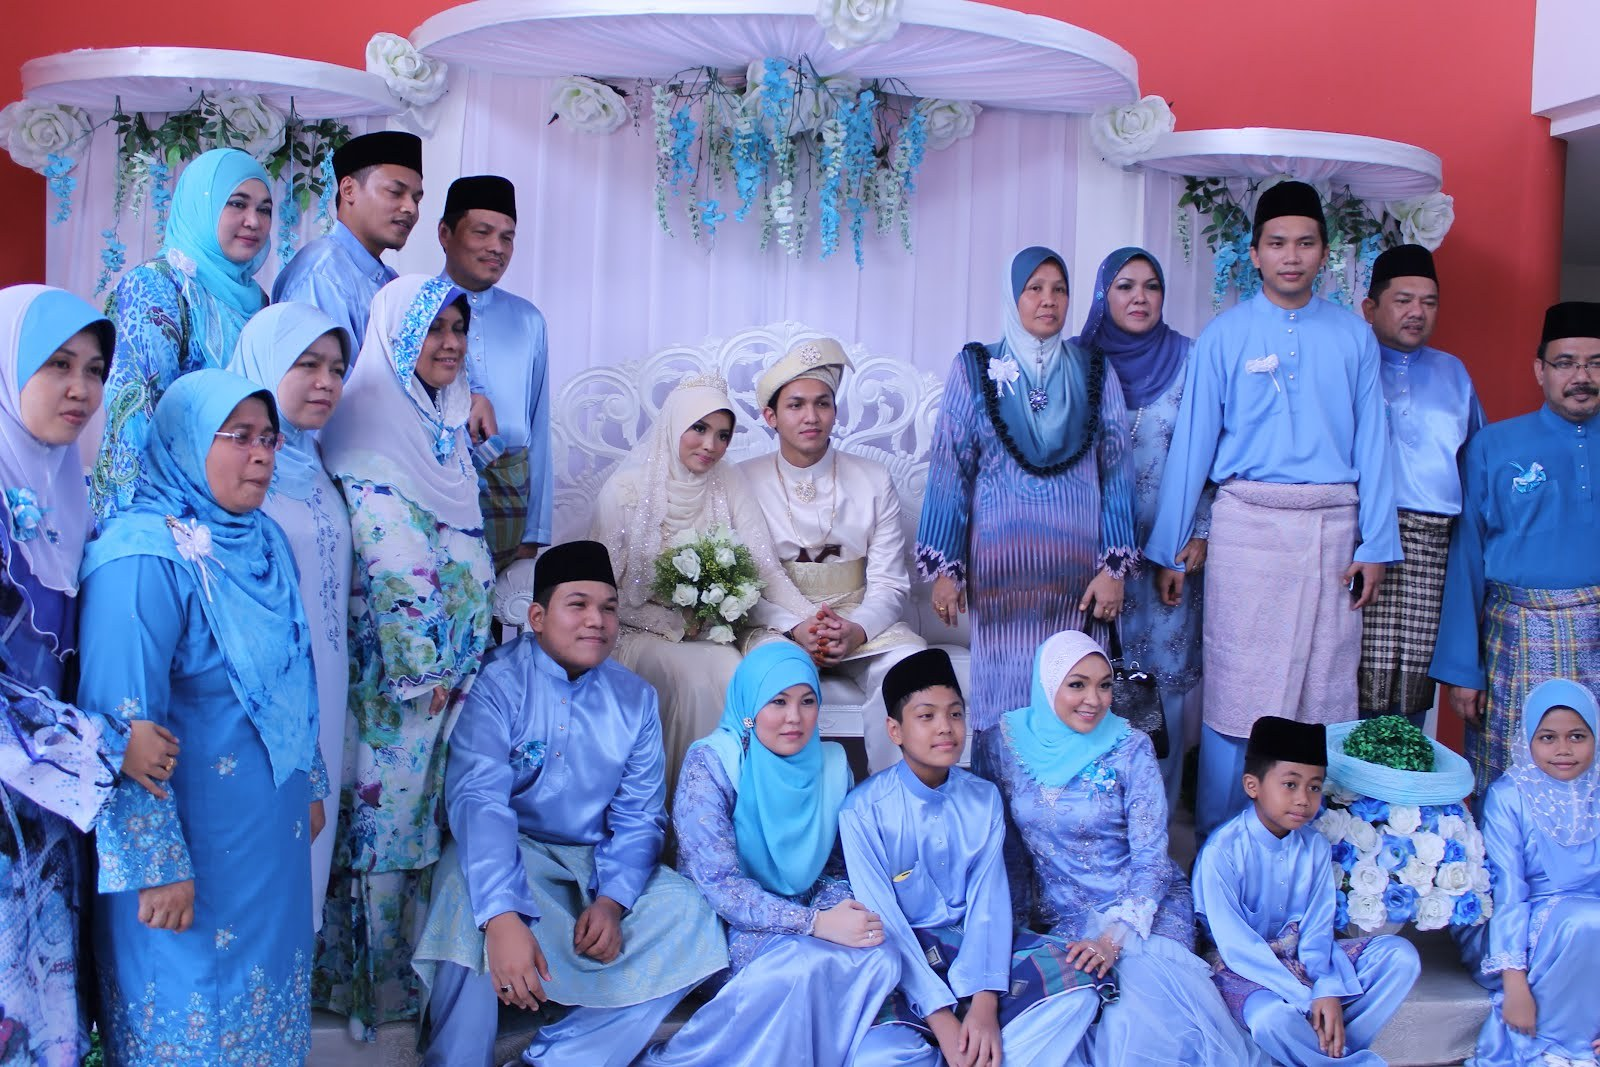 Design Baju Lebaran Seragam Irdz 25 Model Baju Lebaran Keluarga Warna Biru Terbaru 2018